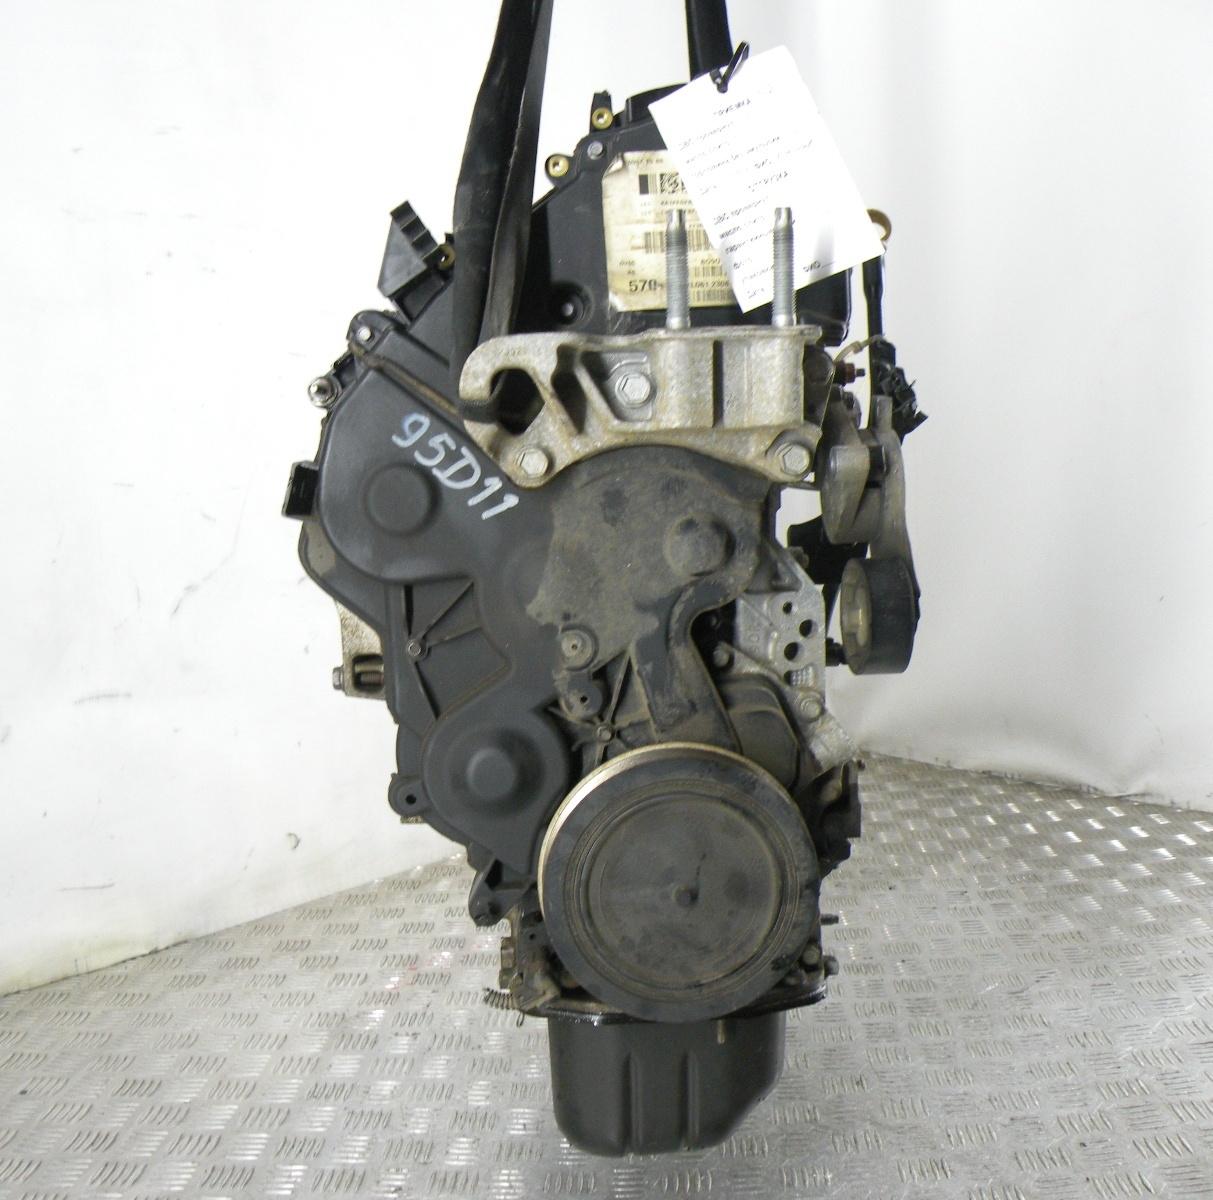 Двигатель дизельный, VOLVO, V60 1, 2012